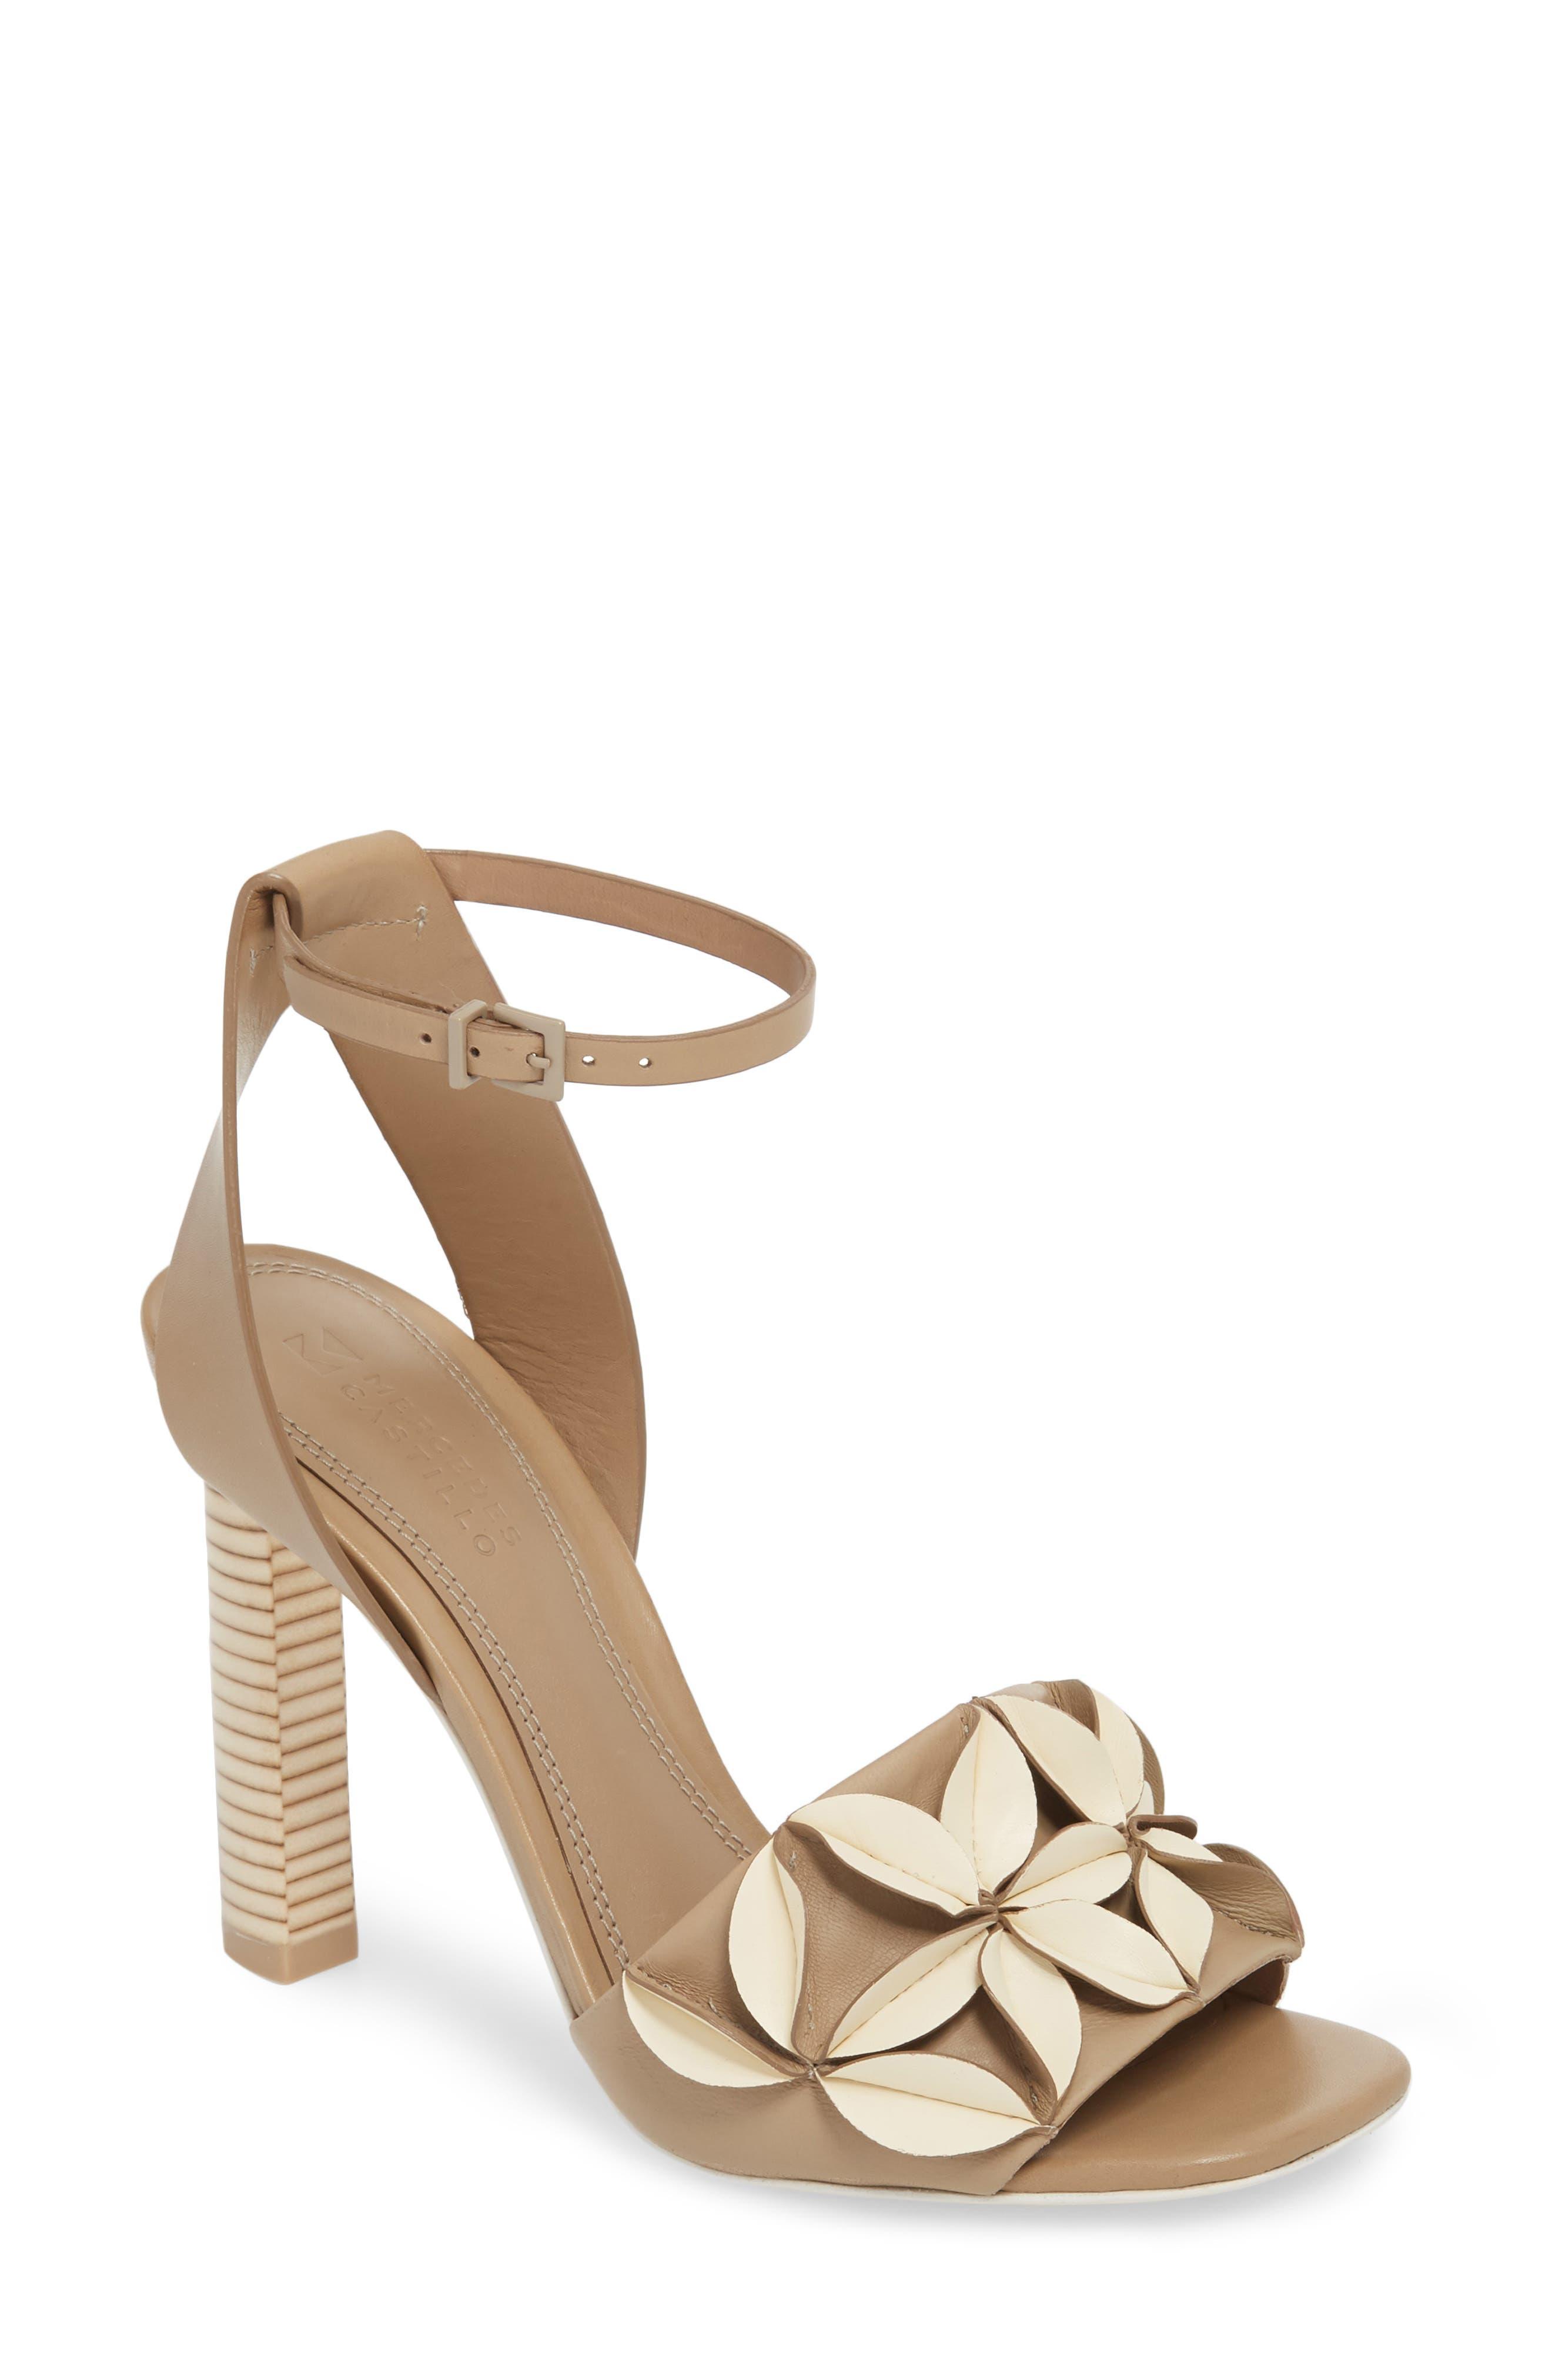 Milee Ankle Strap Sandal,                         Main,                         color, 250